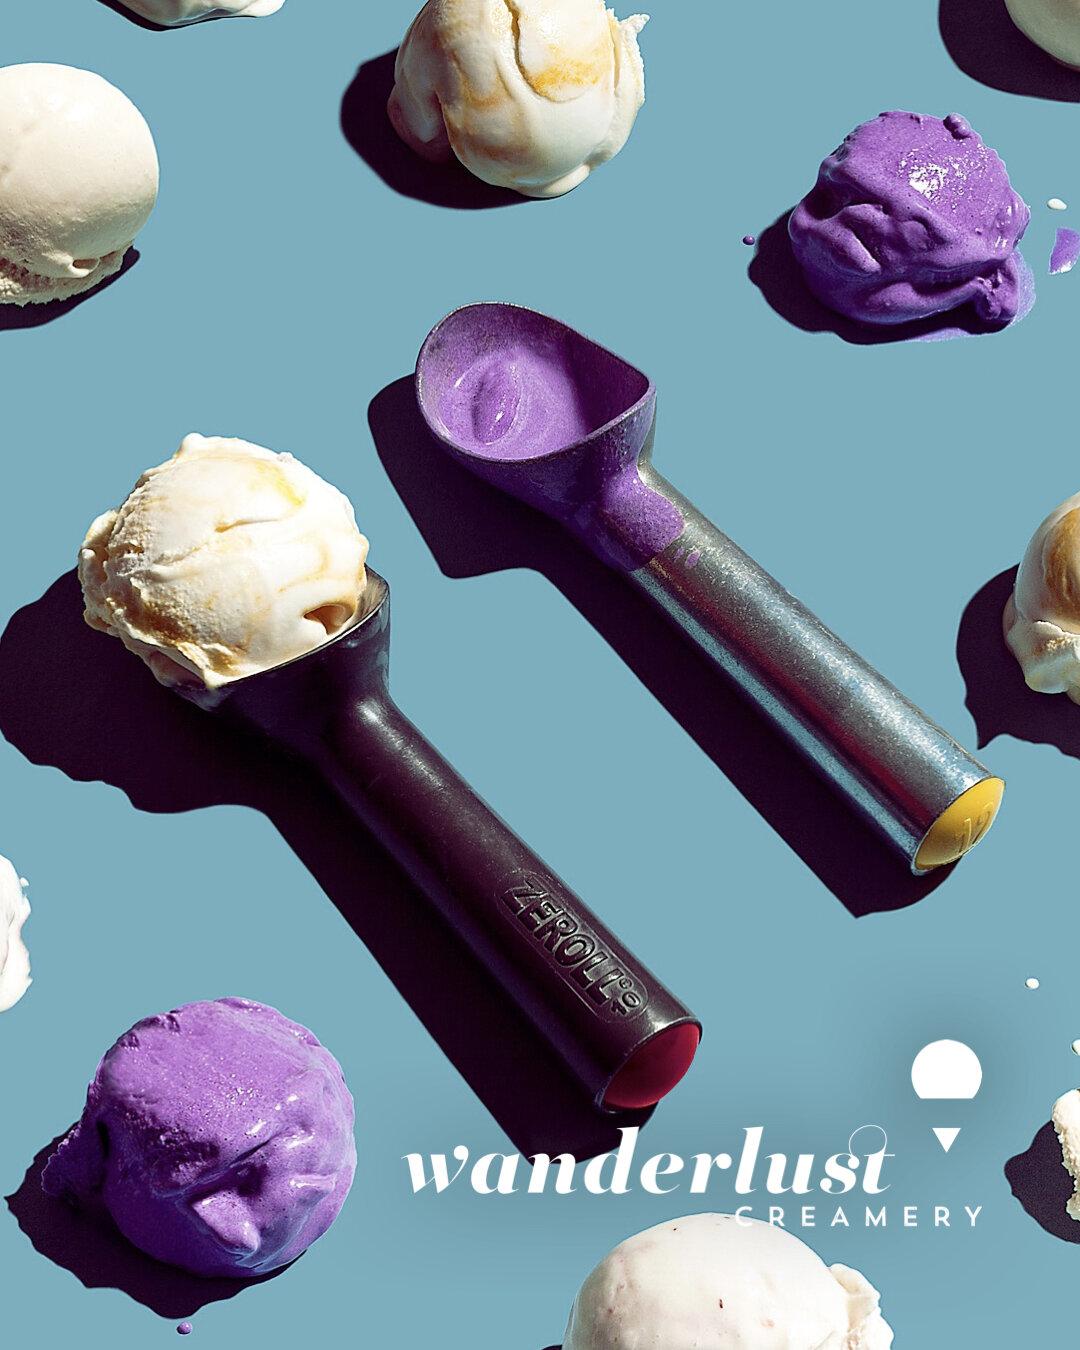 WanderlustCreamery_West 2019 - Headshots.001.jpeg